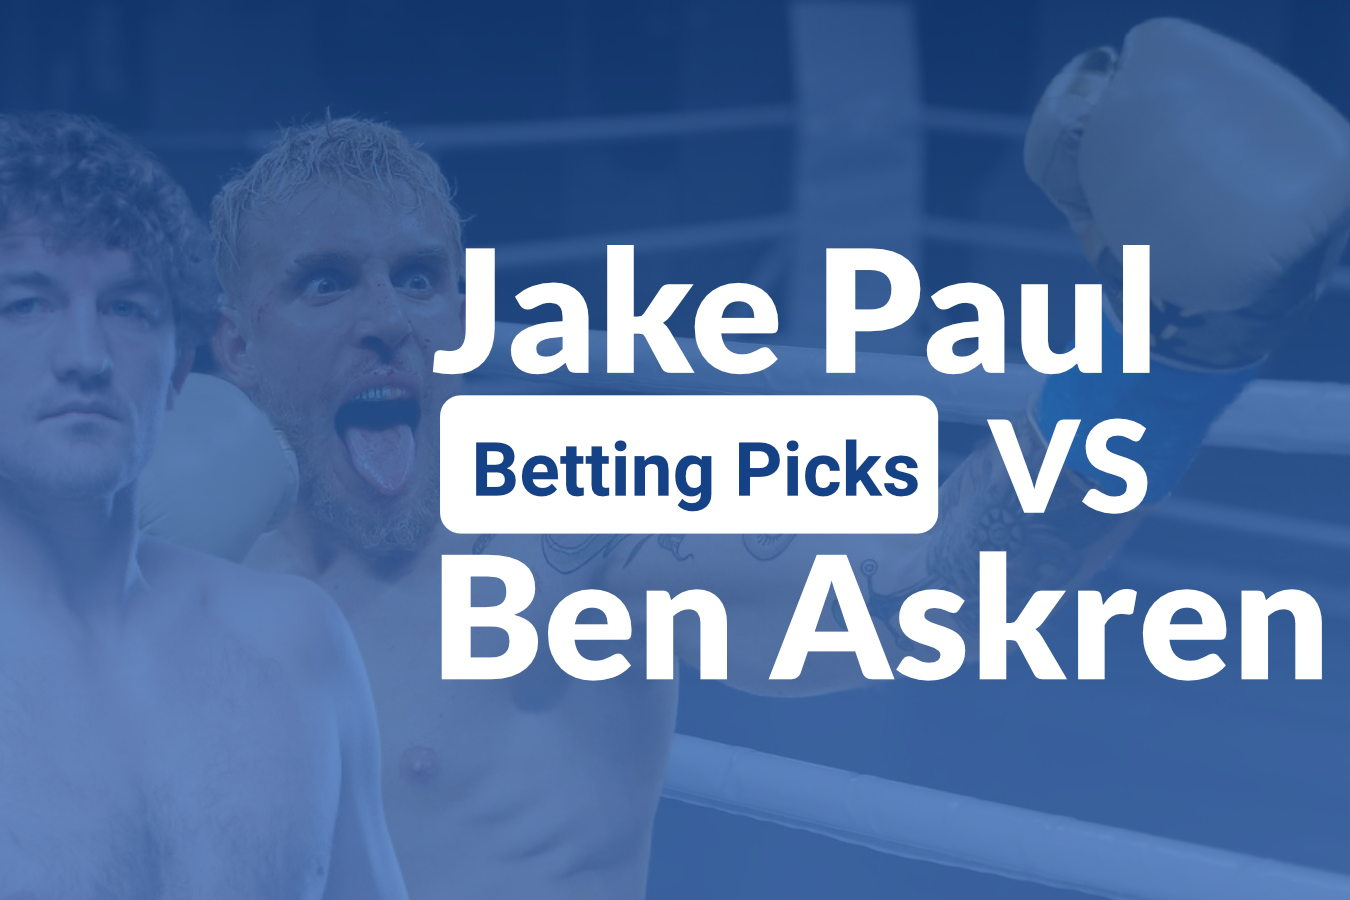 Jake Paul vs Ben Askren: Paul Stepping Up In Class